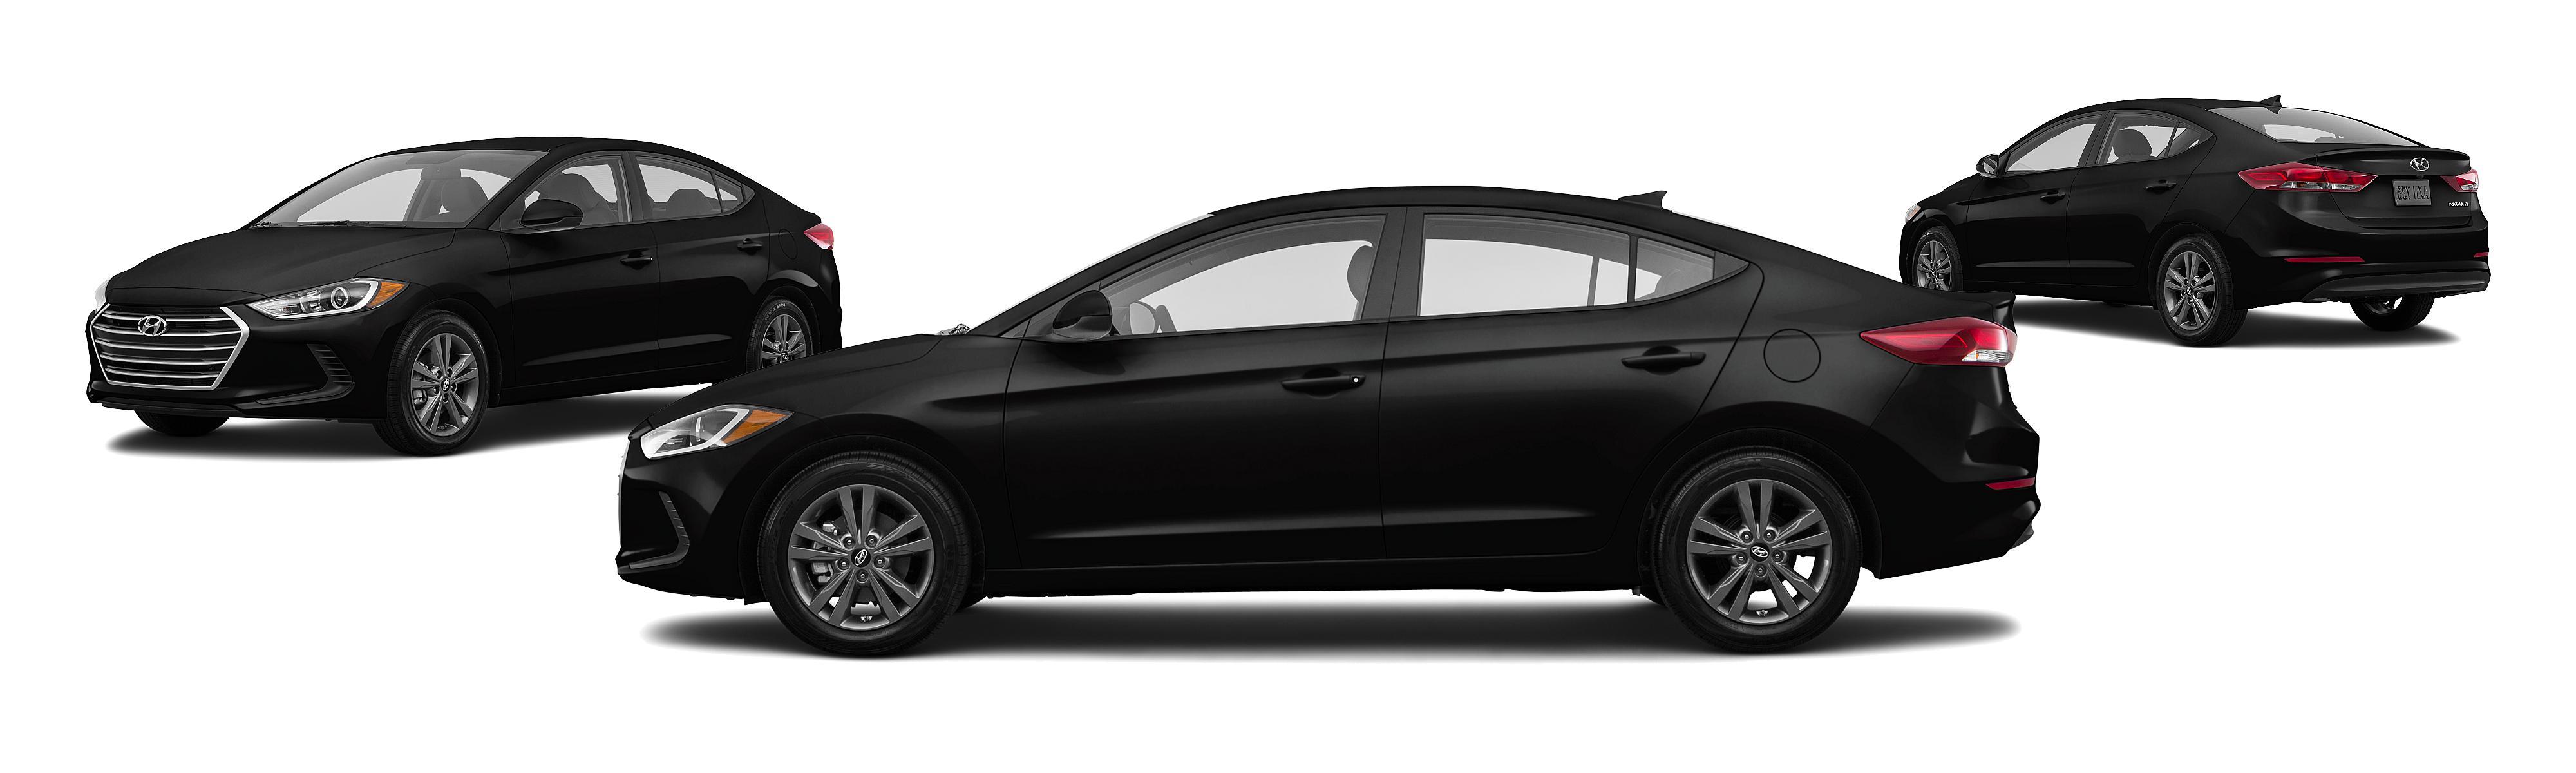 2017 Hyundai Elantra Se 4dr Sedan Us Midyear Release Research